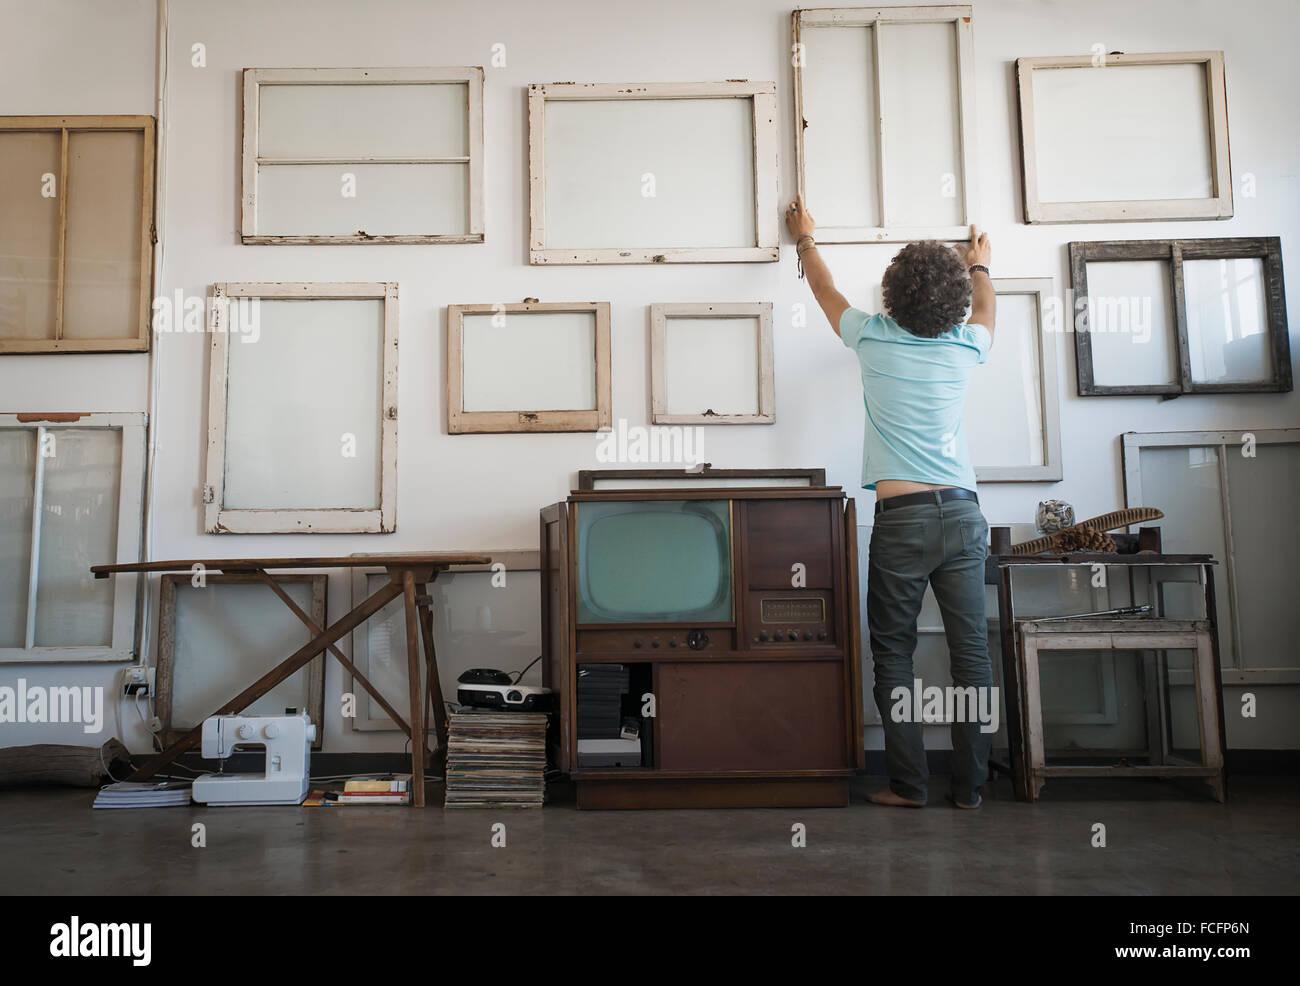 Loft-Dekor. Ein Mann hängen gerahmte Bild Gemälde an der Wand. Stockbild